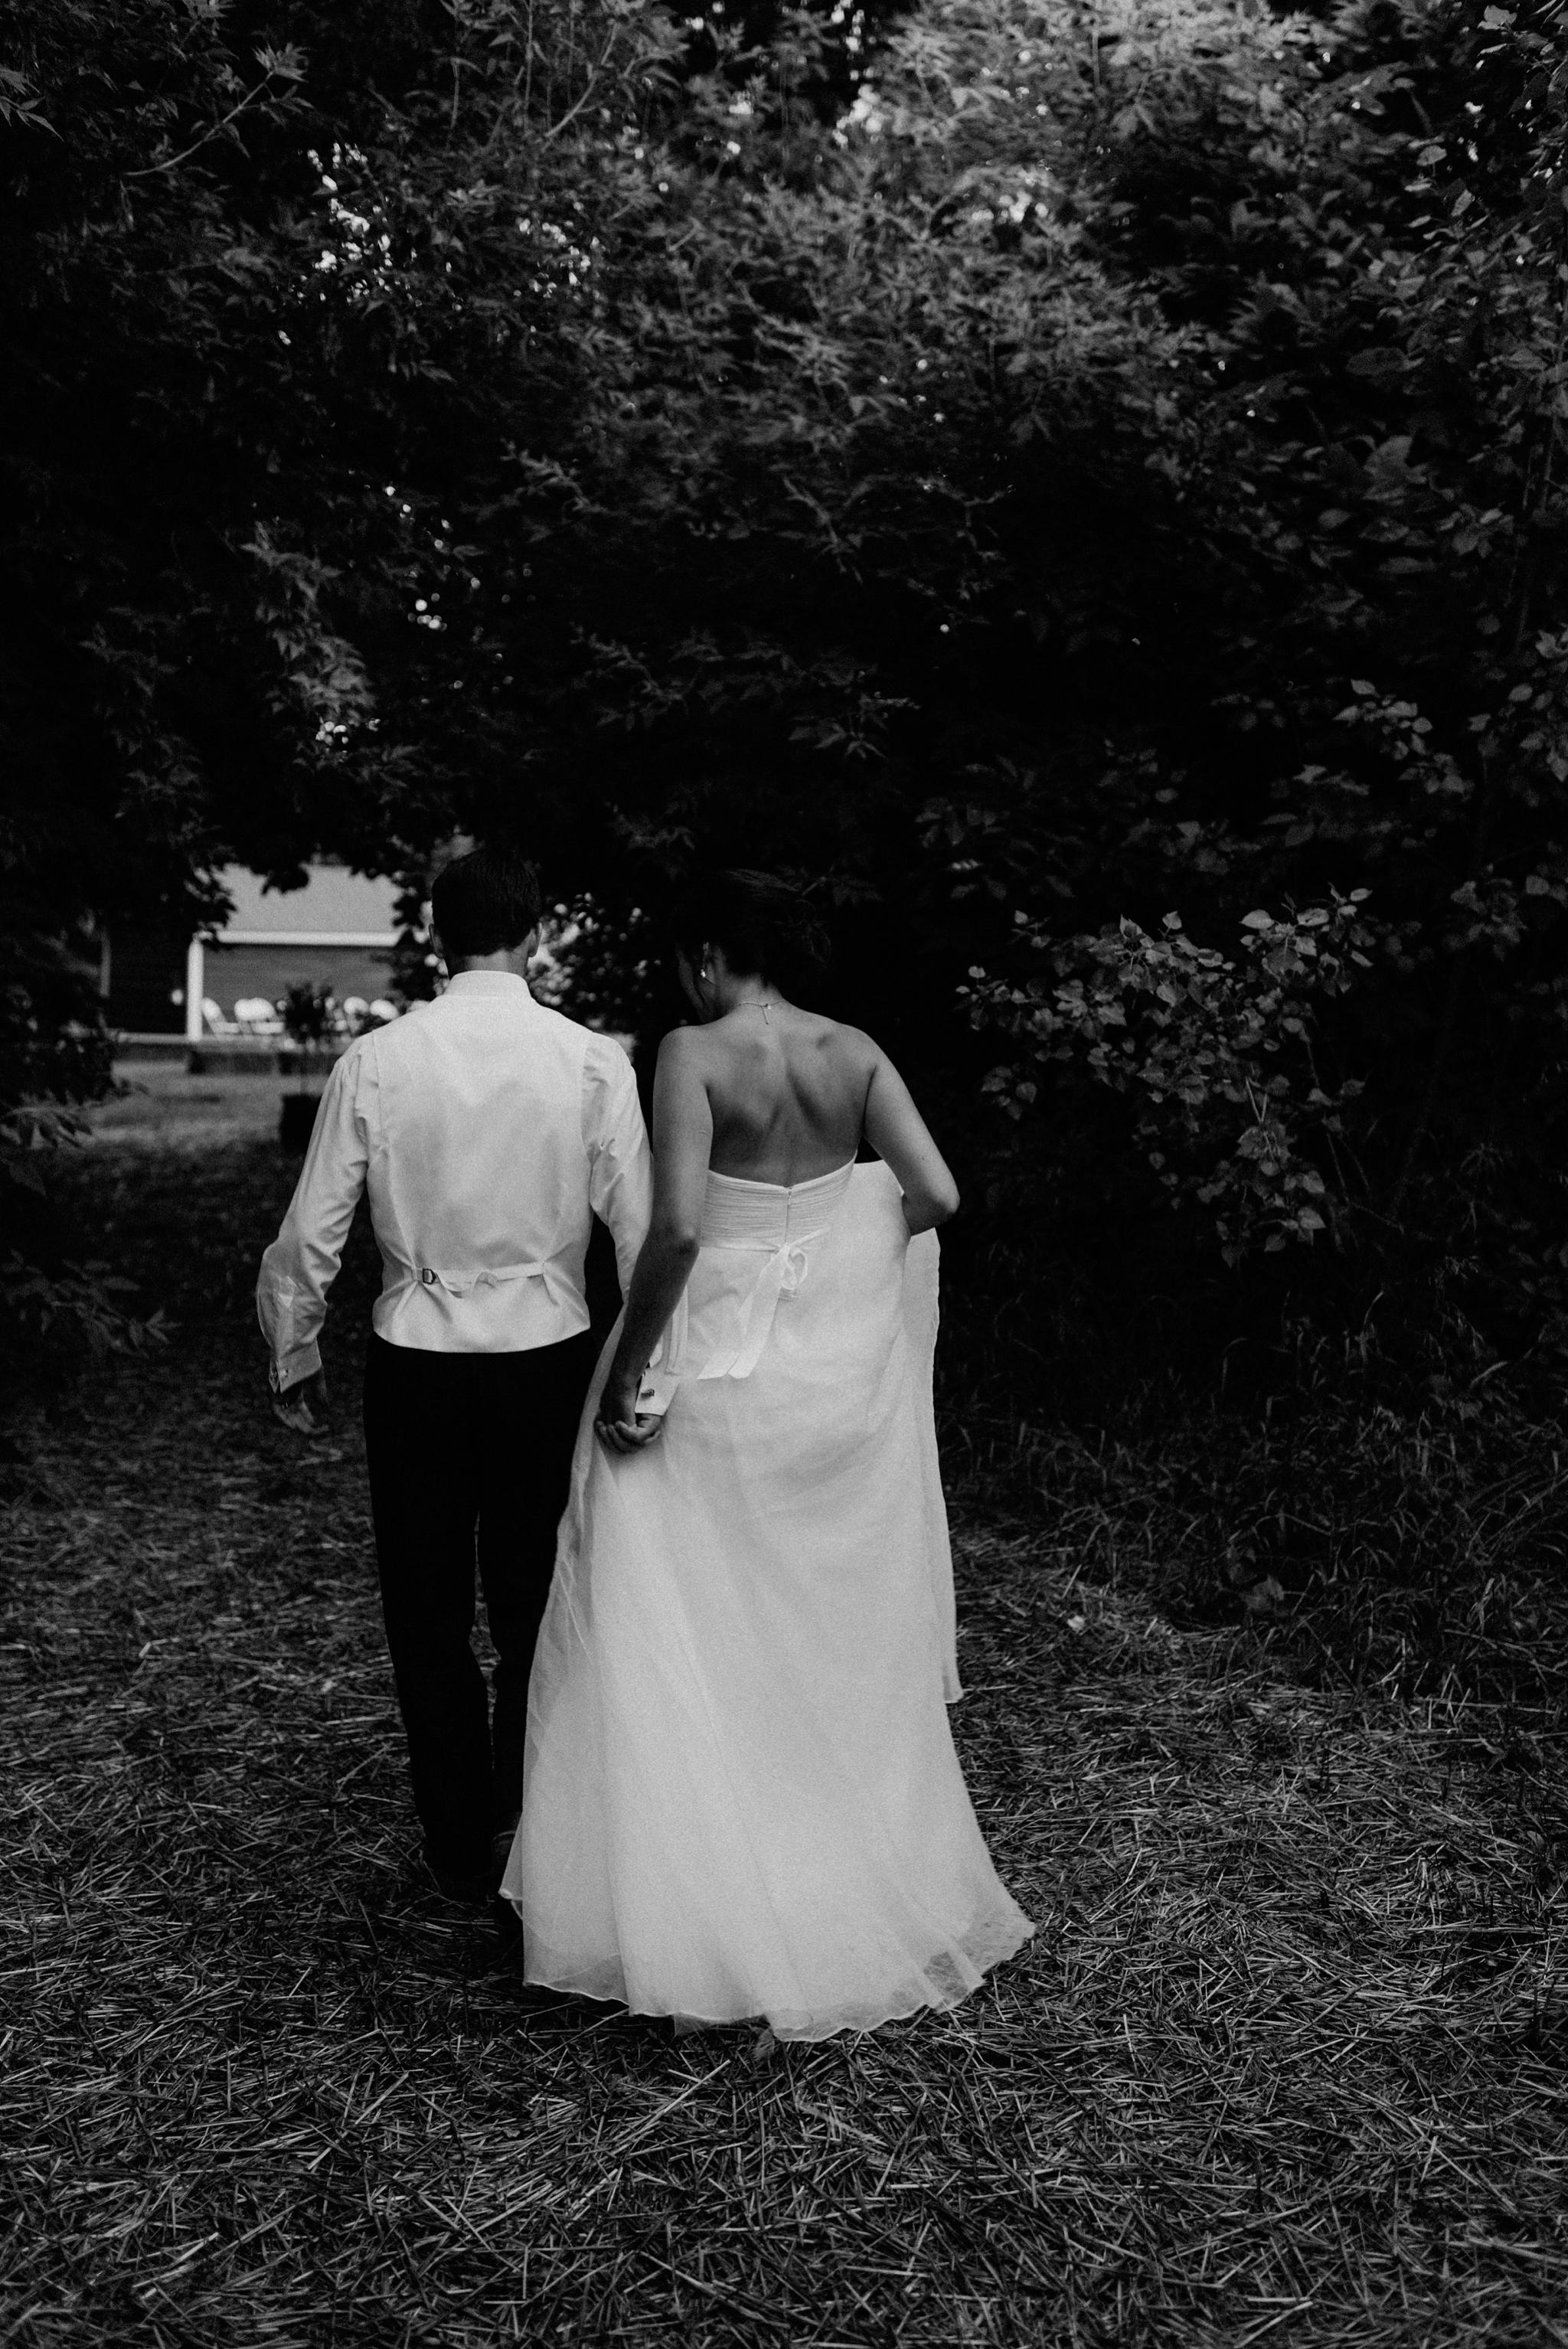 kaihla_tonai_intimate_wedding_elopement_photographer_0079